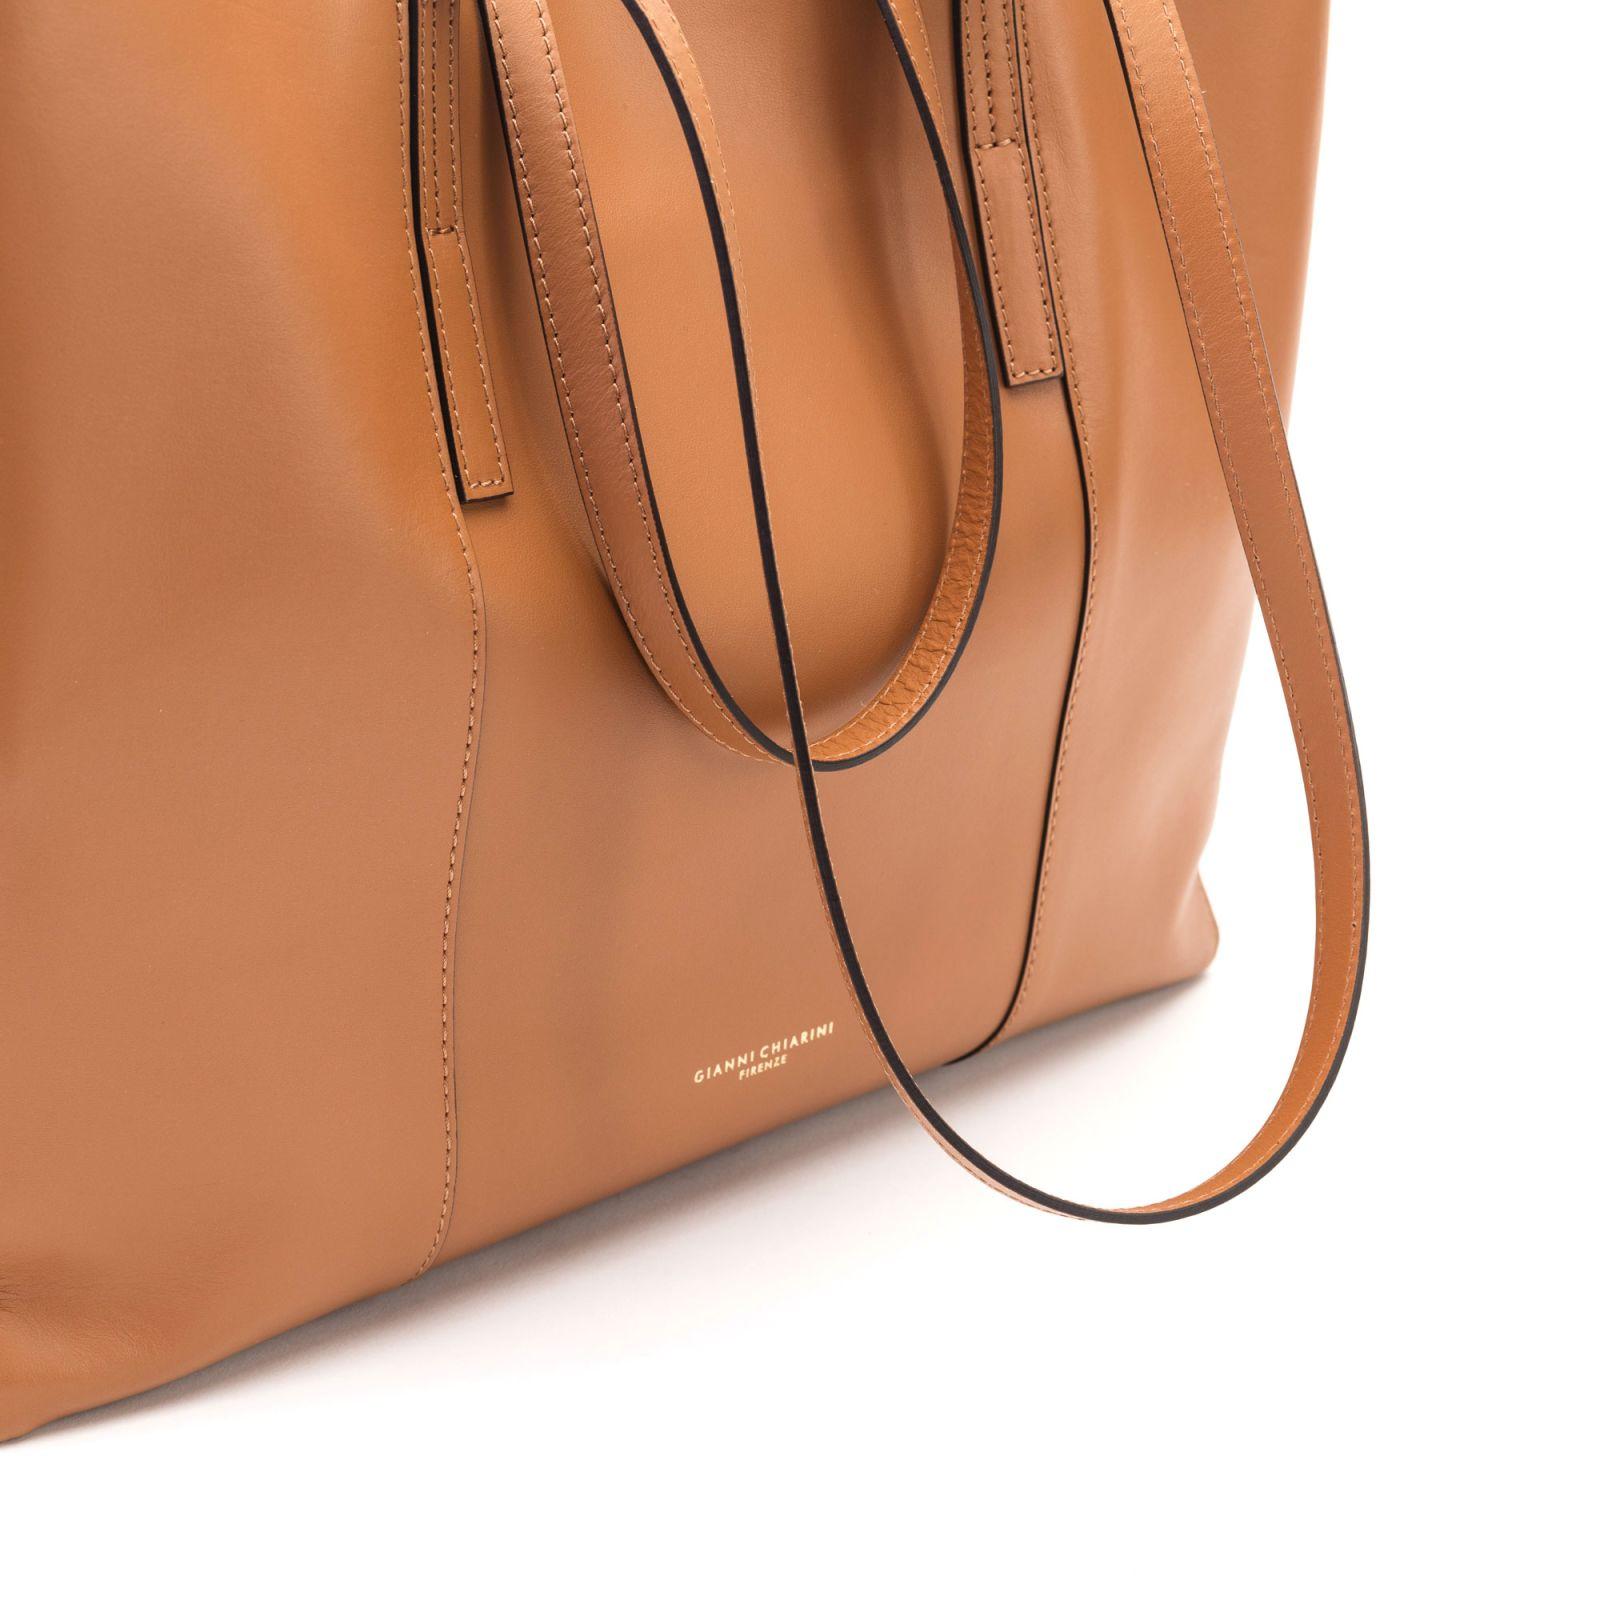 929794a235 Gianni Chiarini Gianni Chiarini Leather Tote Bag - LEATHER ...